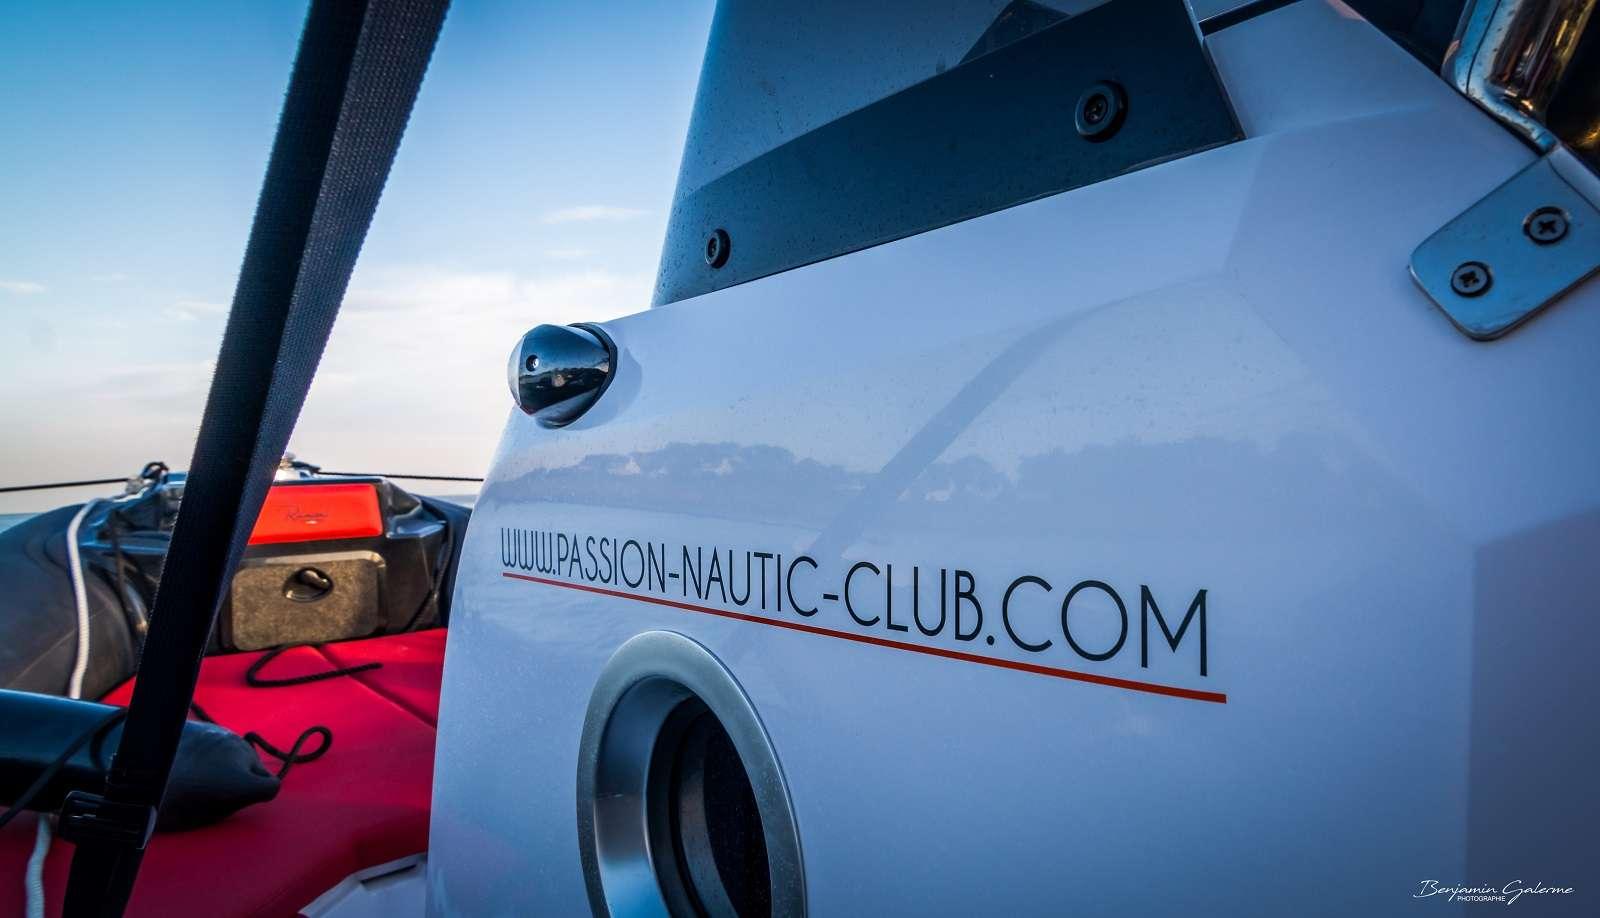 Passion Nautic Club